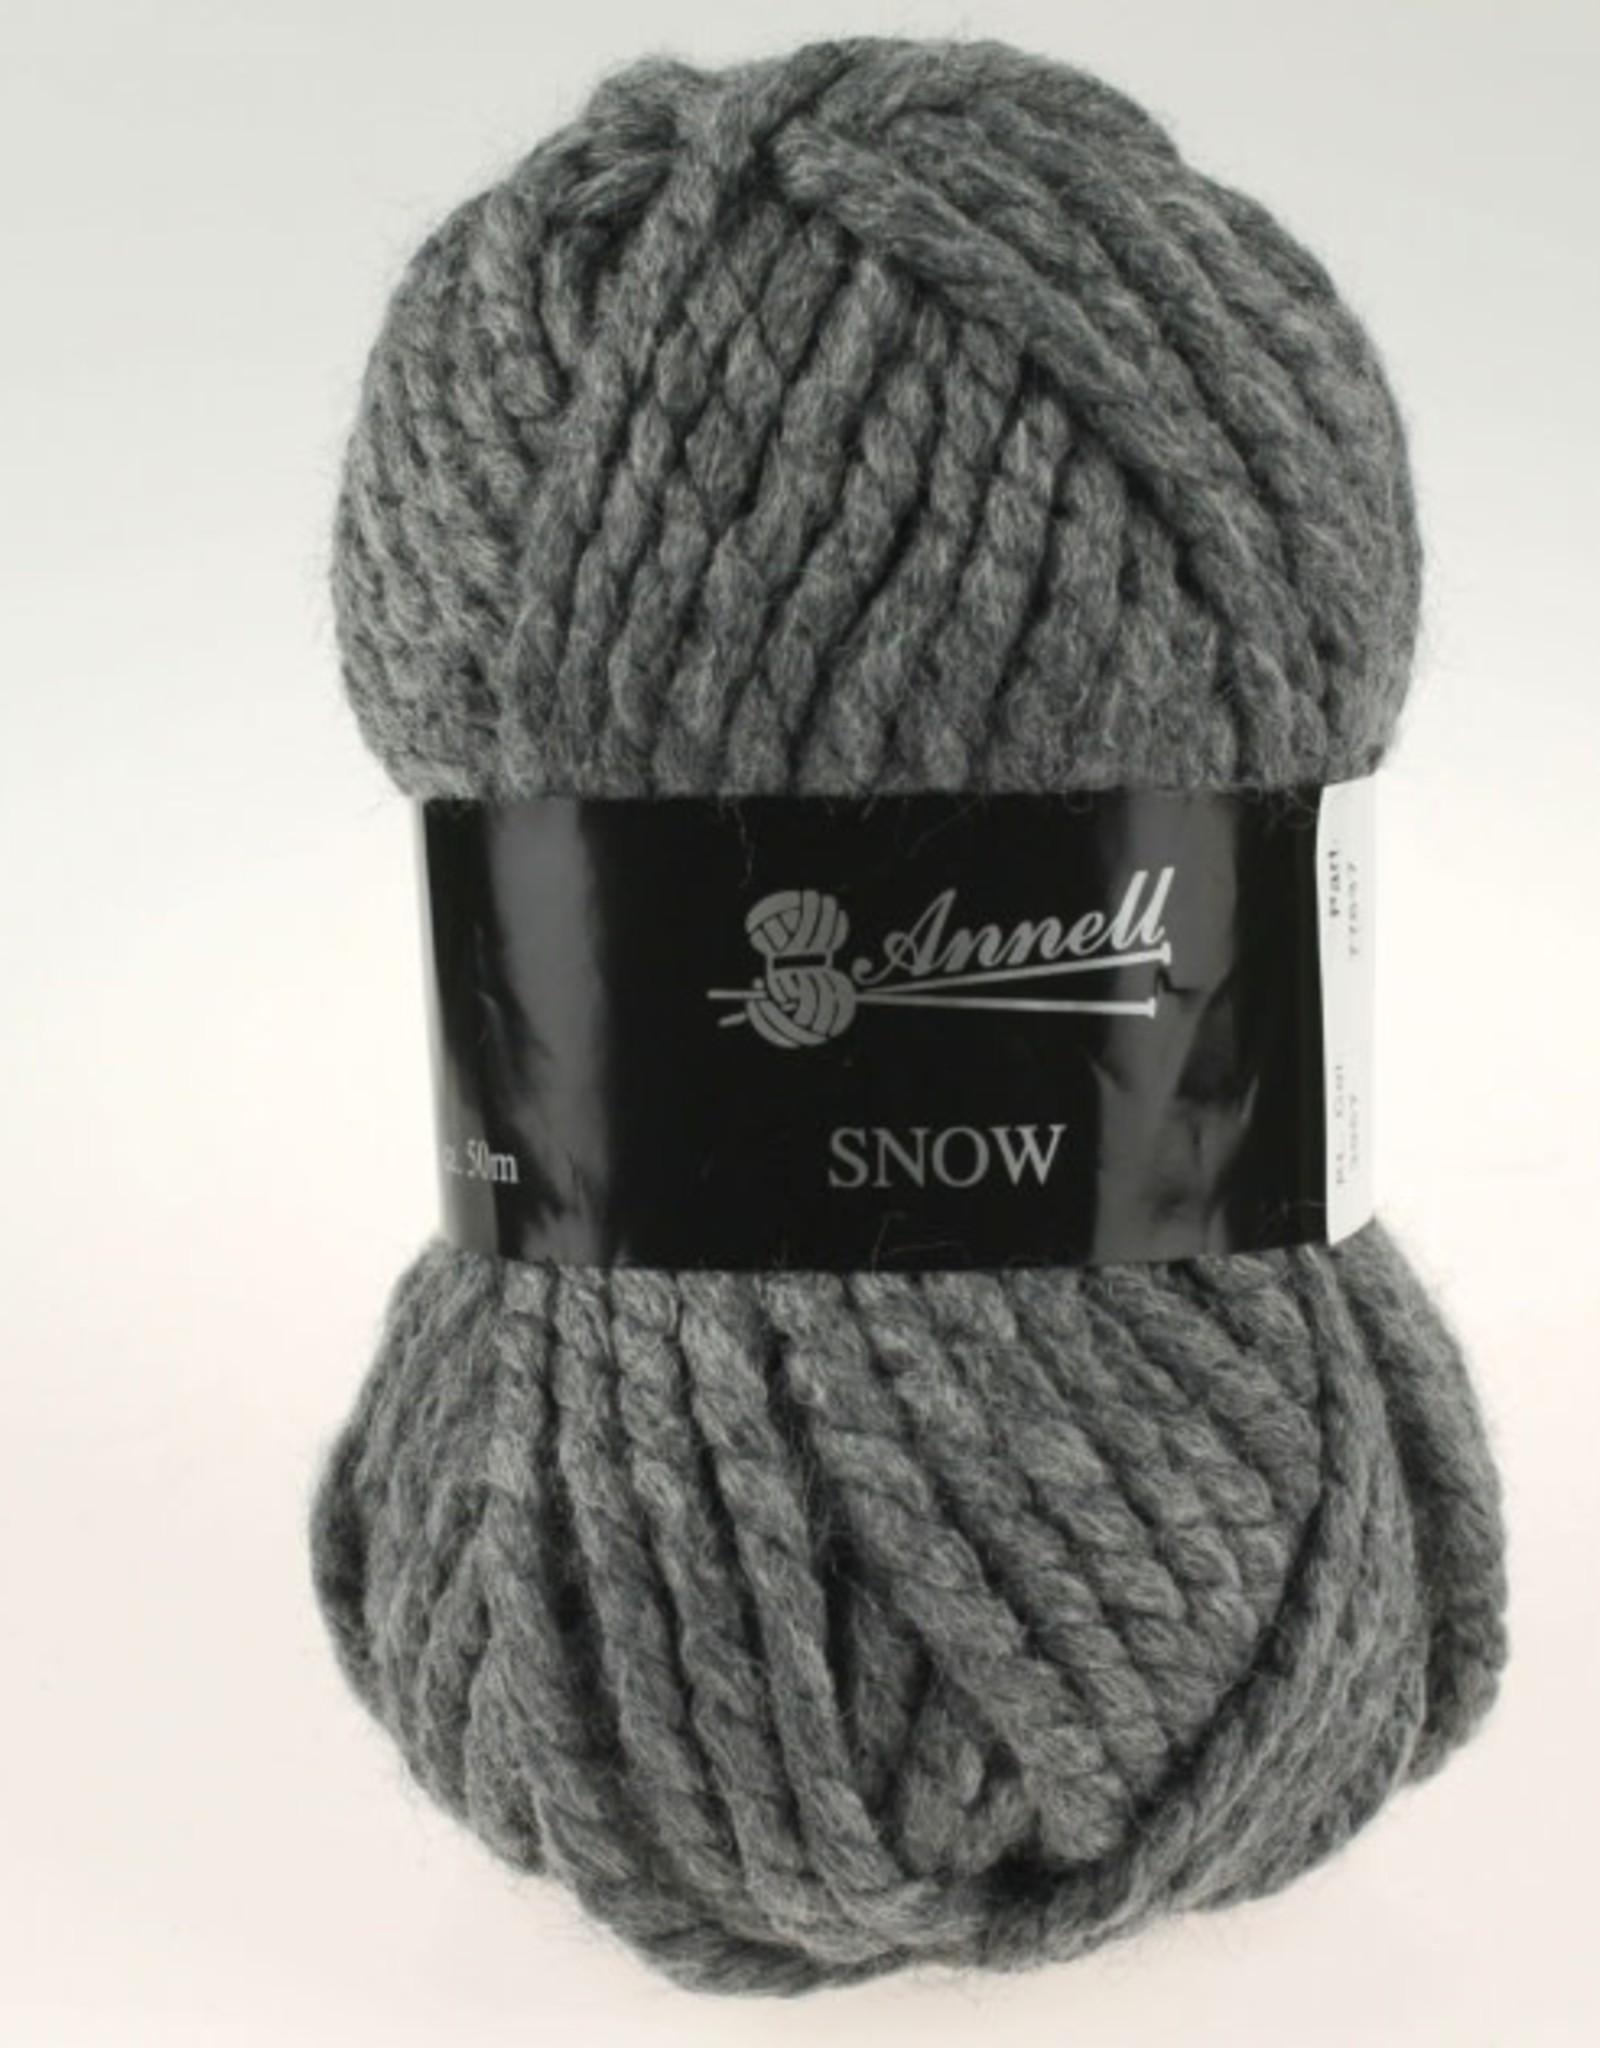 Annell Annell Snow 3957